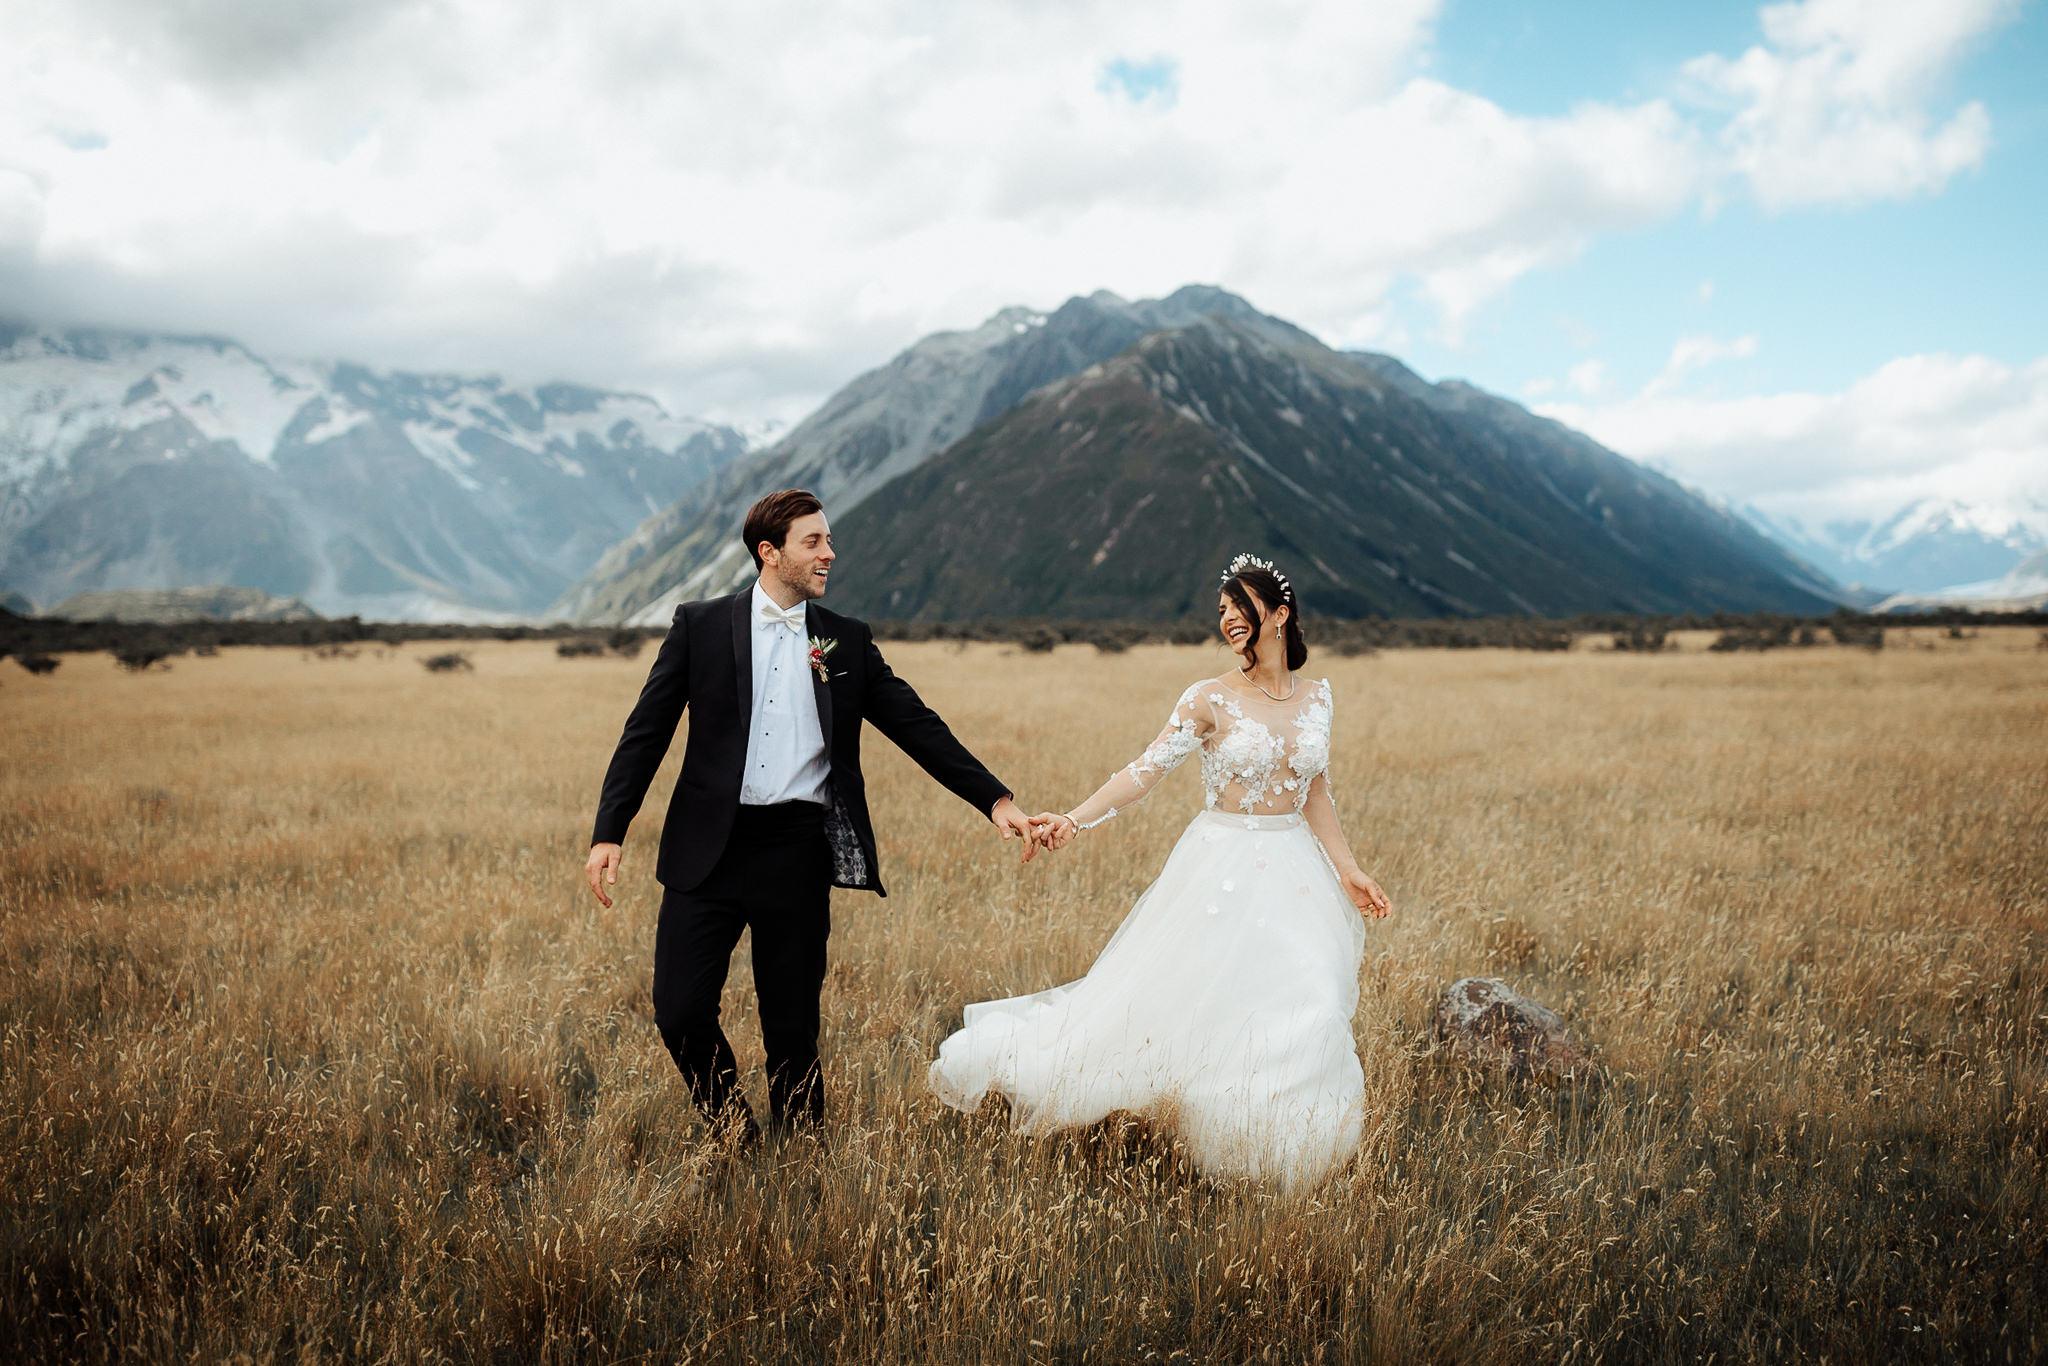 Hollow & Co. Wedding Photographer Videographer